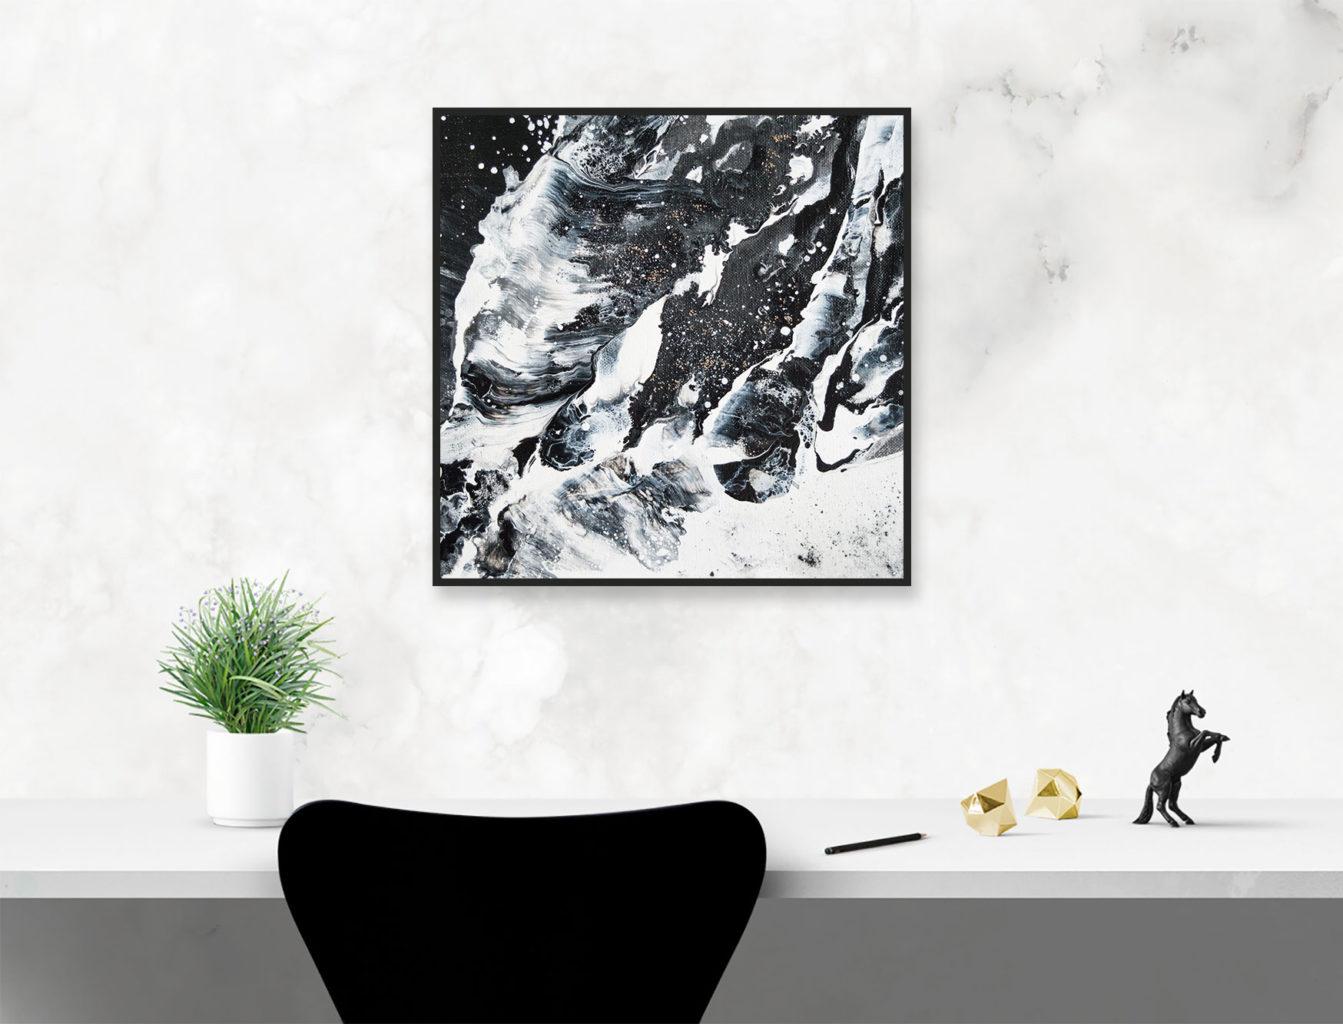 Original abstract black and white landscape by Milena Gaytandzhieva